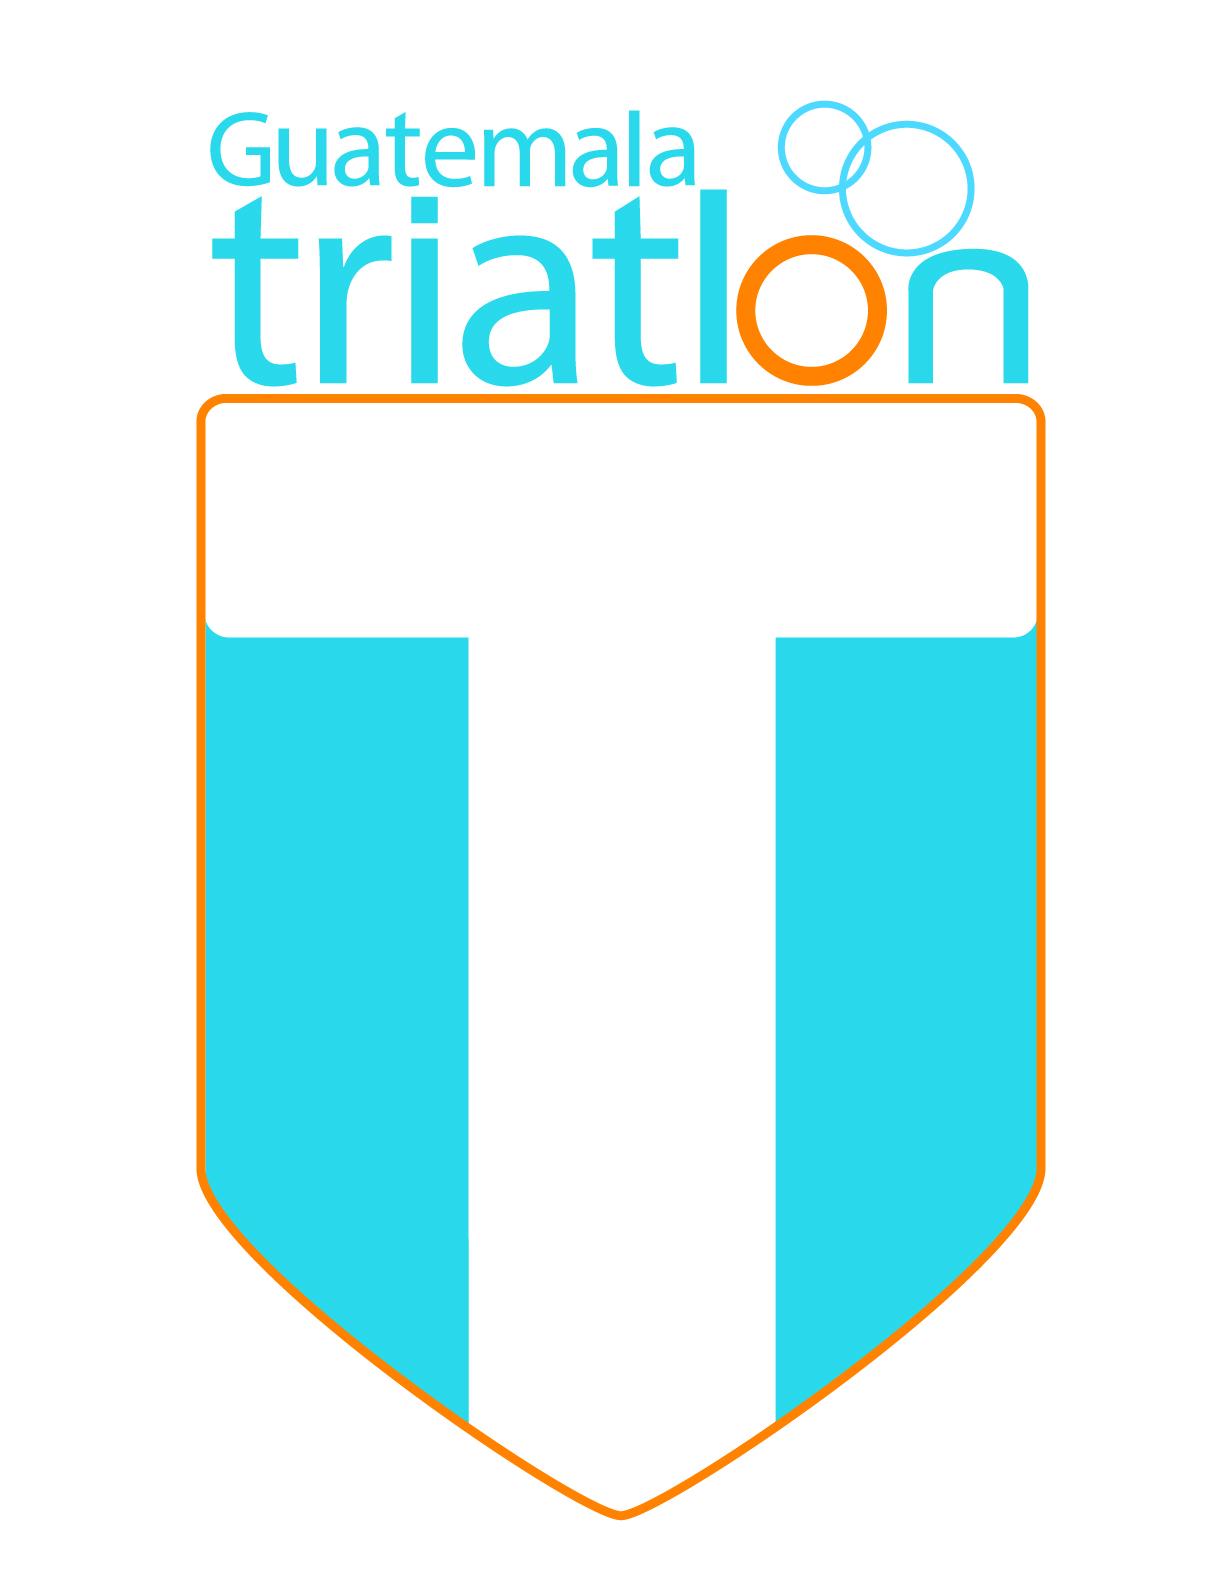 FEDERACION DEPORTIVA NACIONAL DE TRIATLON, GUATEMALA logo